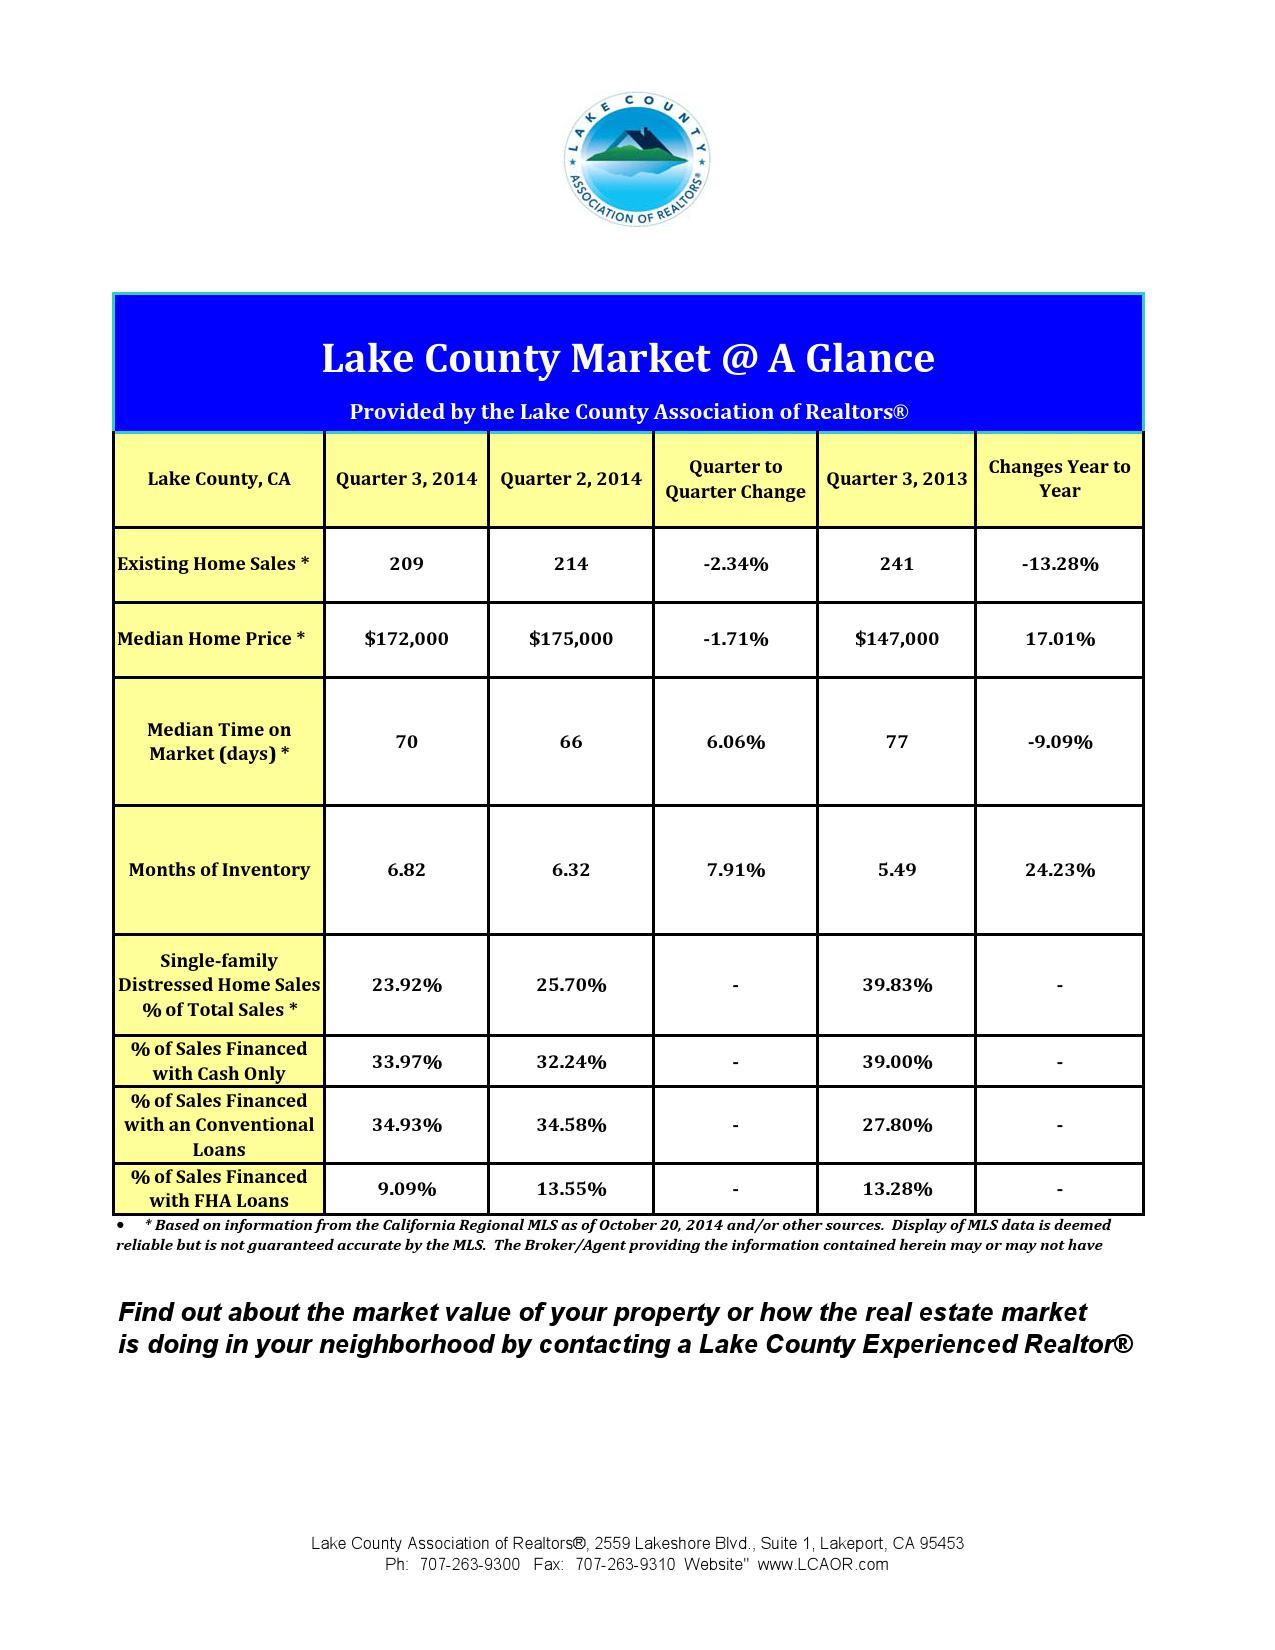 Market Statistics, Q3 2014